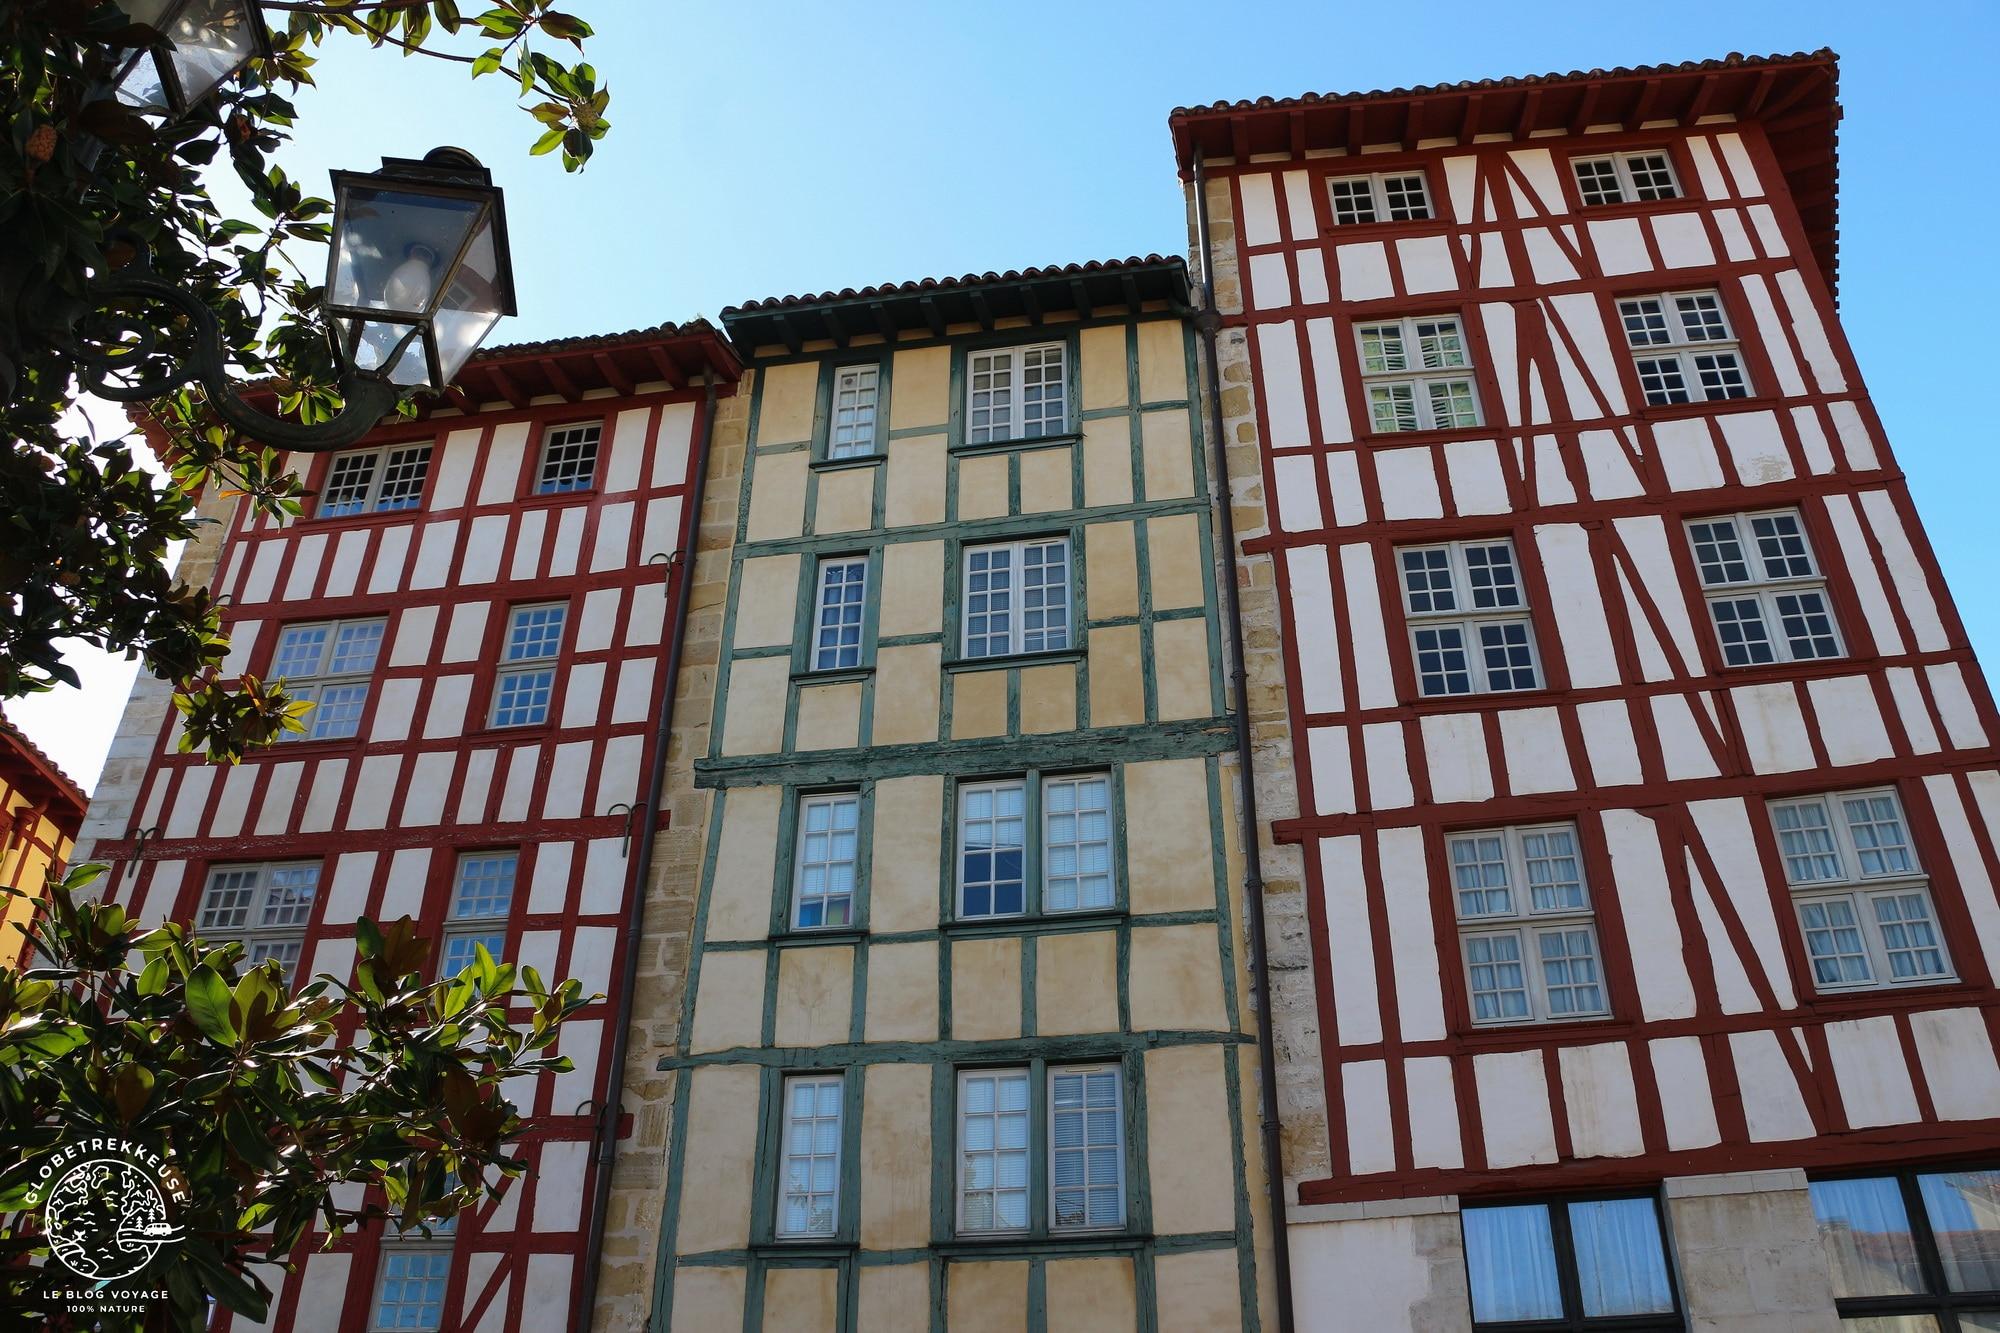 3 jours au pays basque bayonne